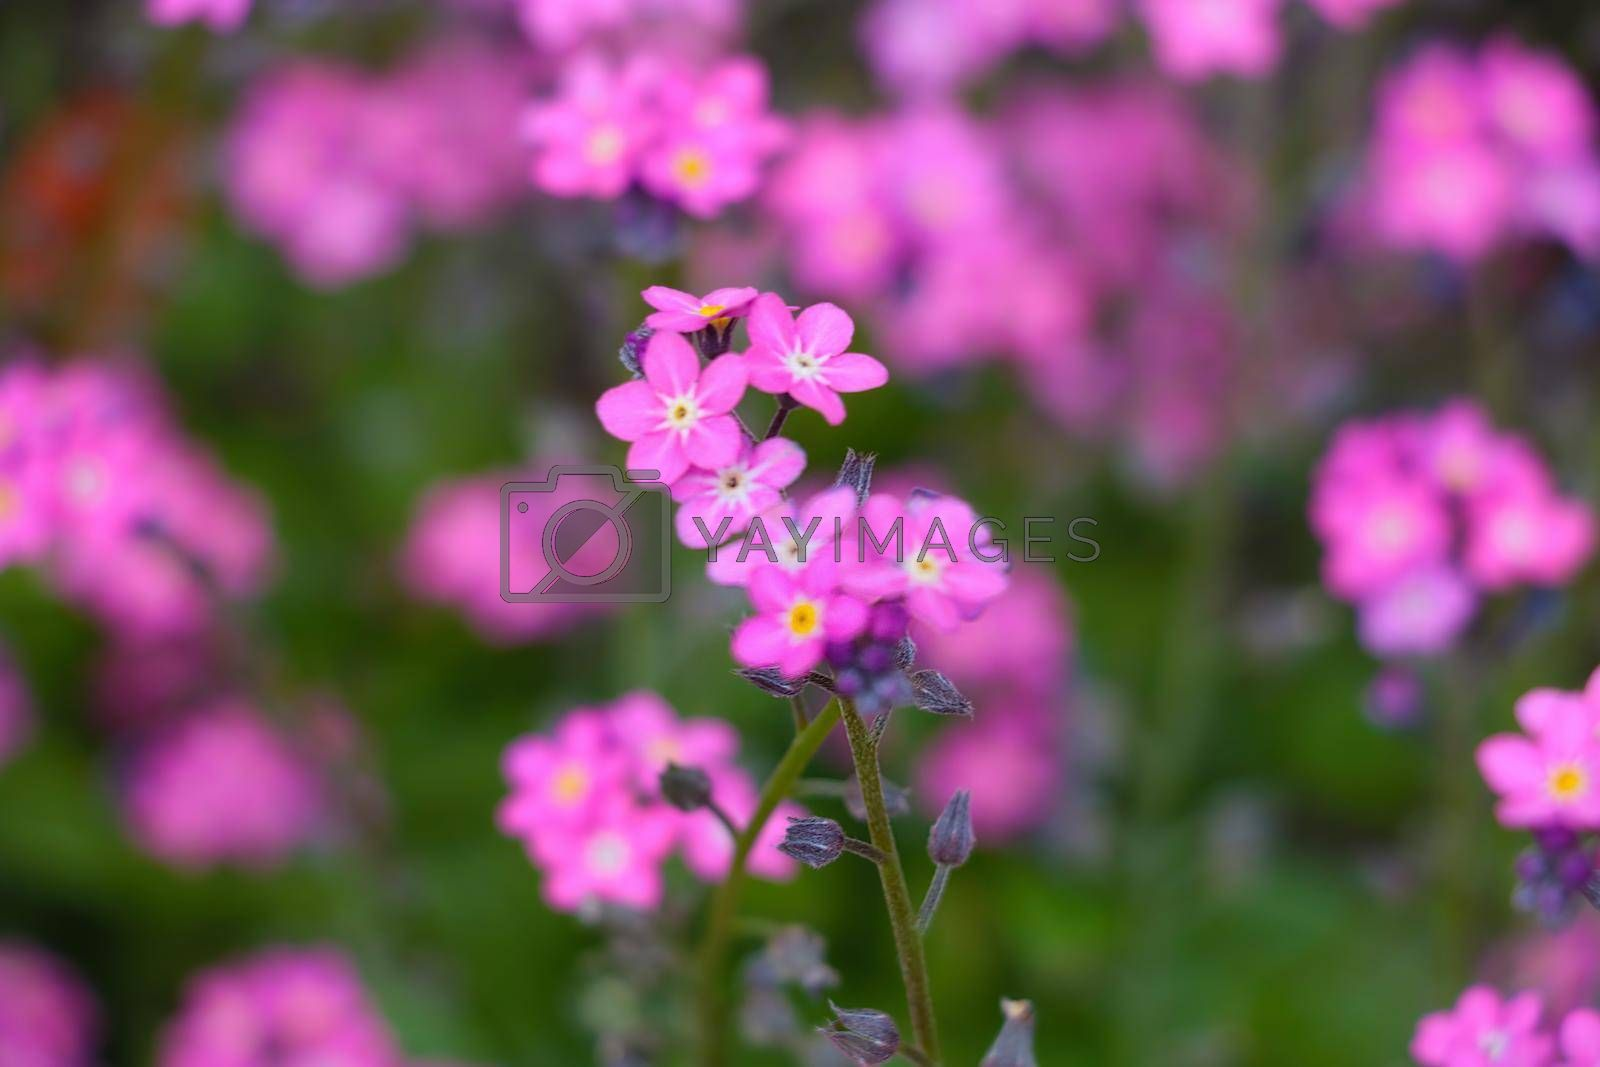 Royalty free image of Beautiful perennial flowers bloom in the summer meadow. by kip02kas